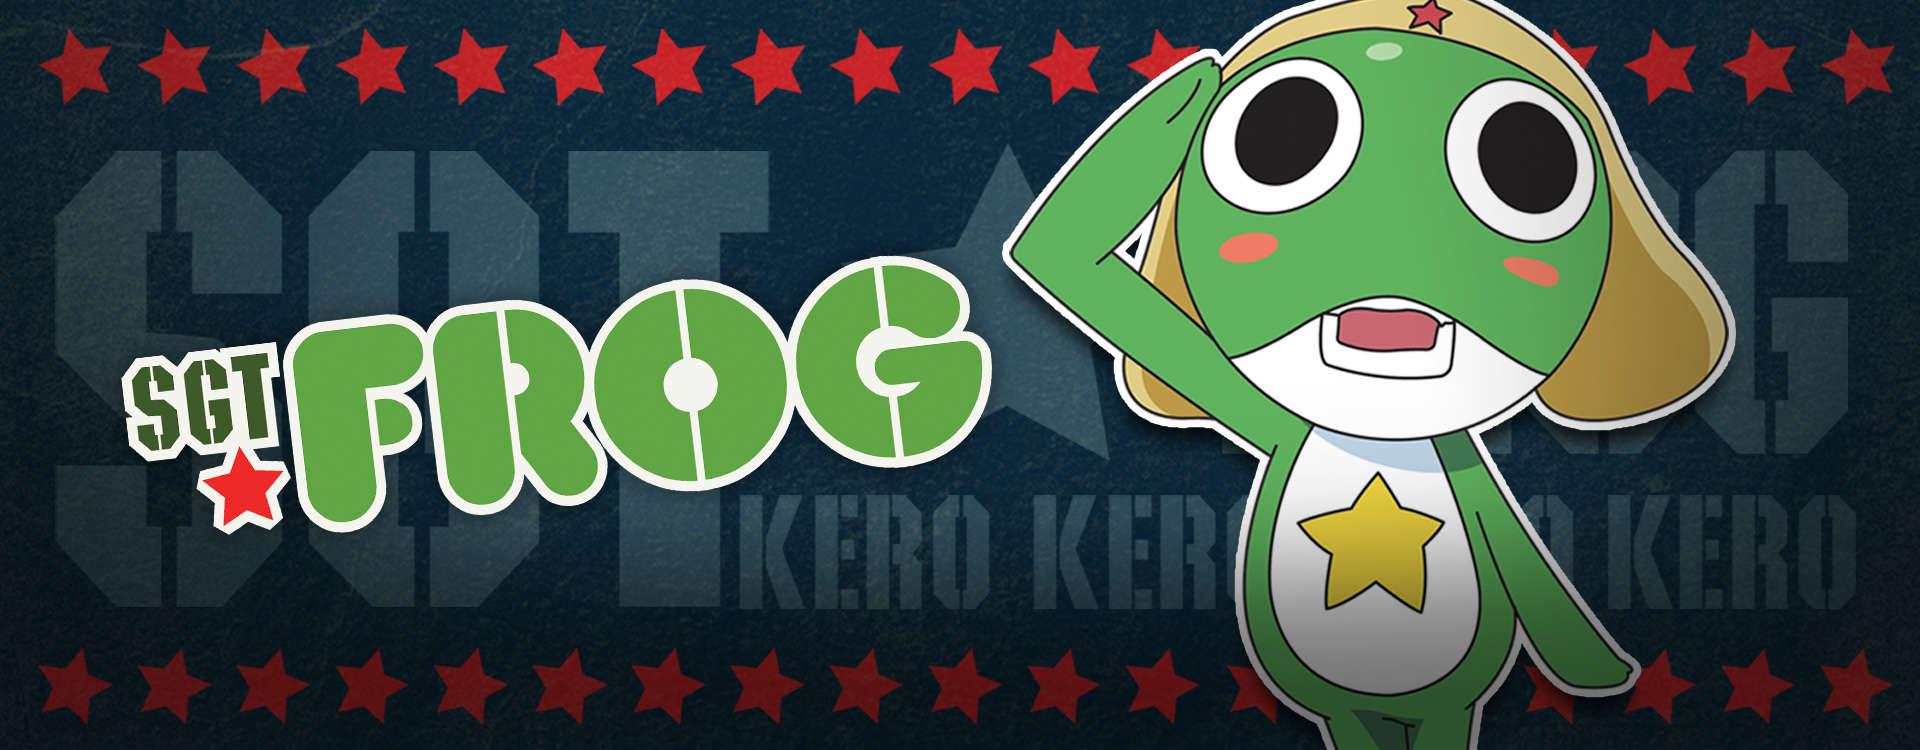 Sgt. Frog